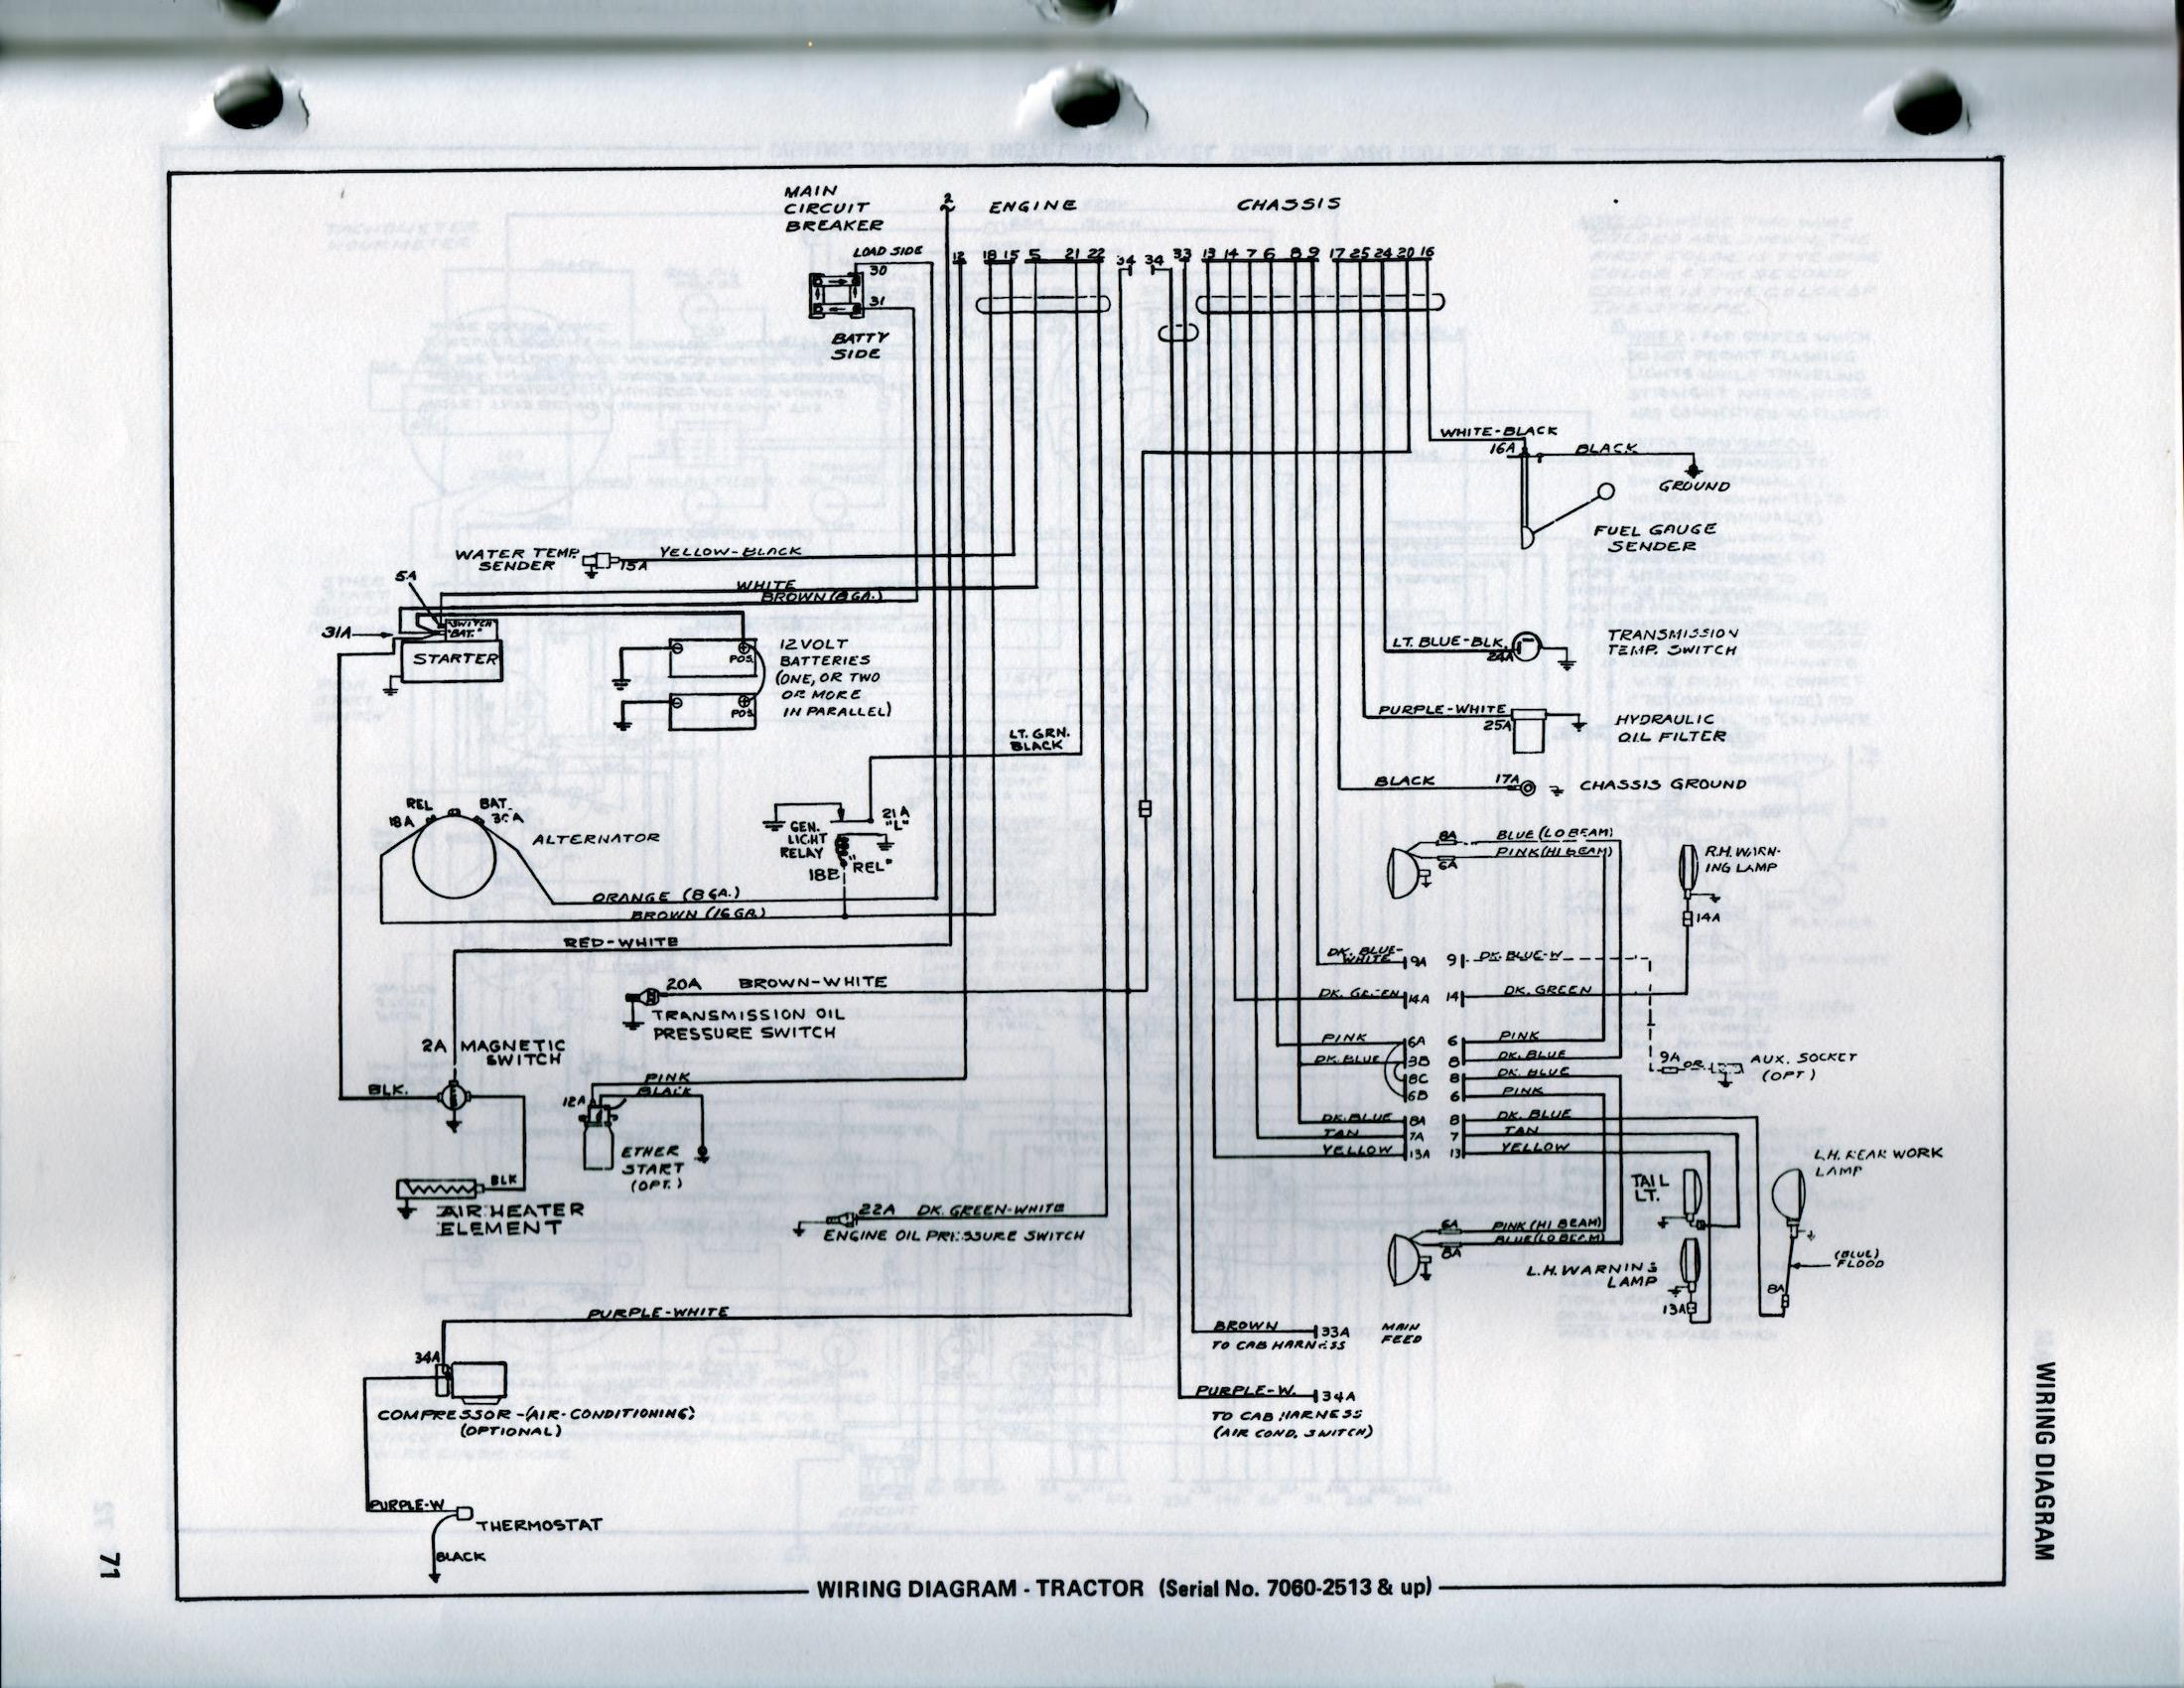 allis chalmers wc wiring diagram allis chalmers d15 wiring